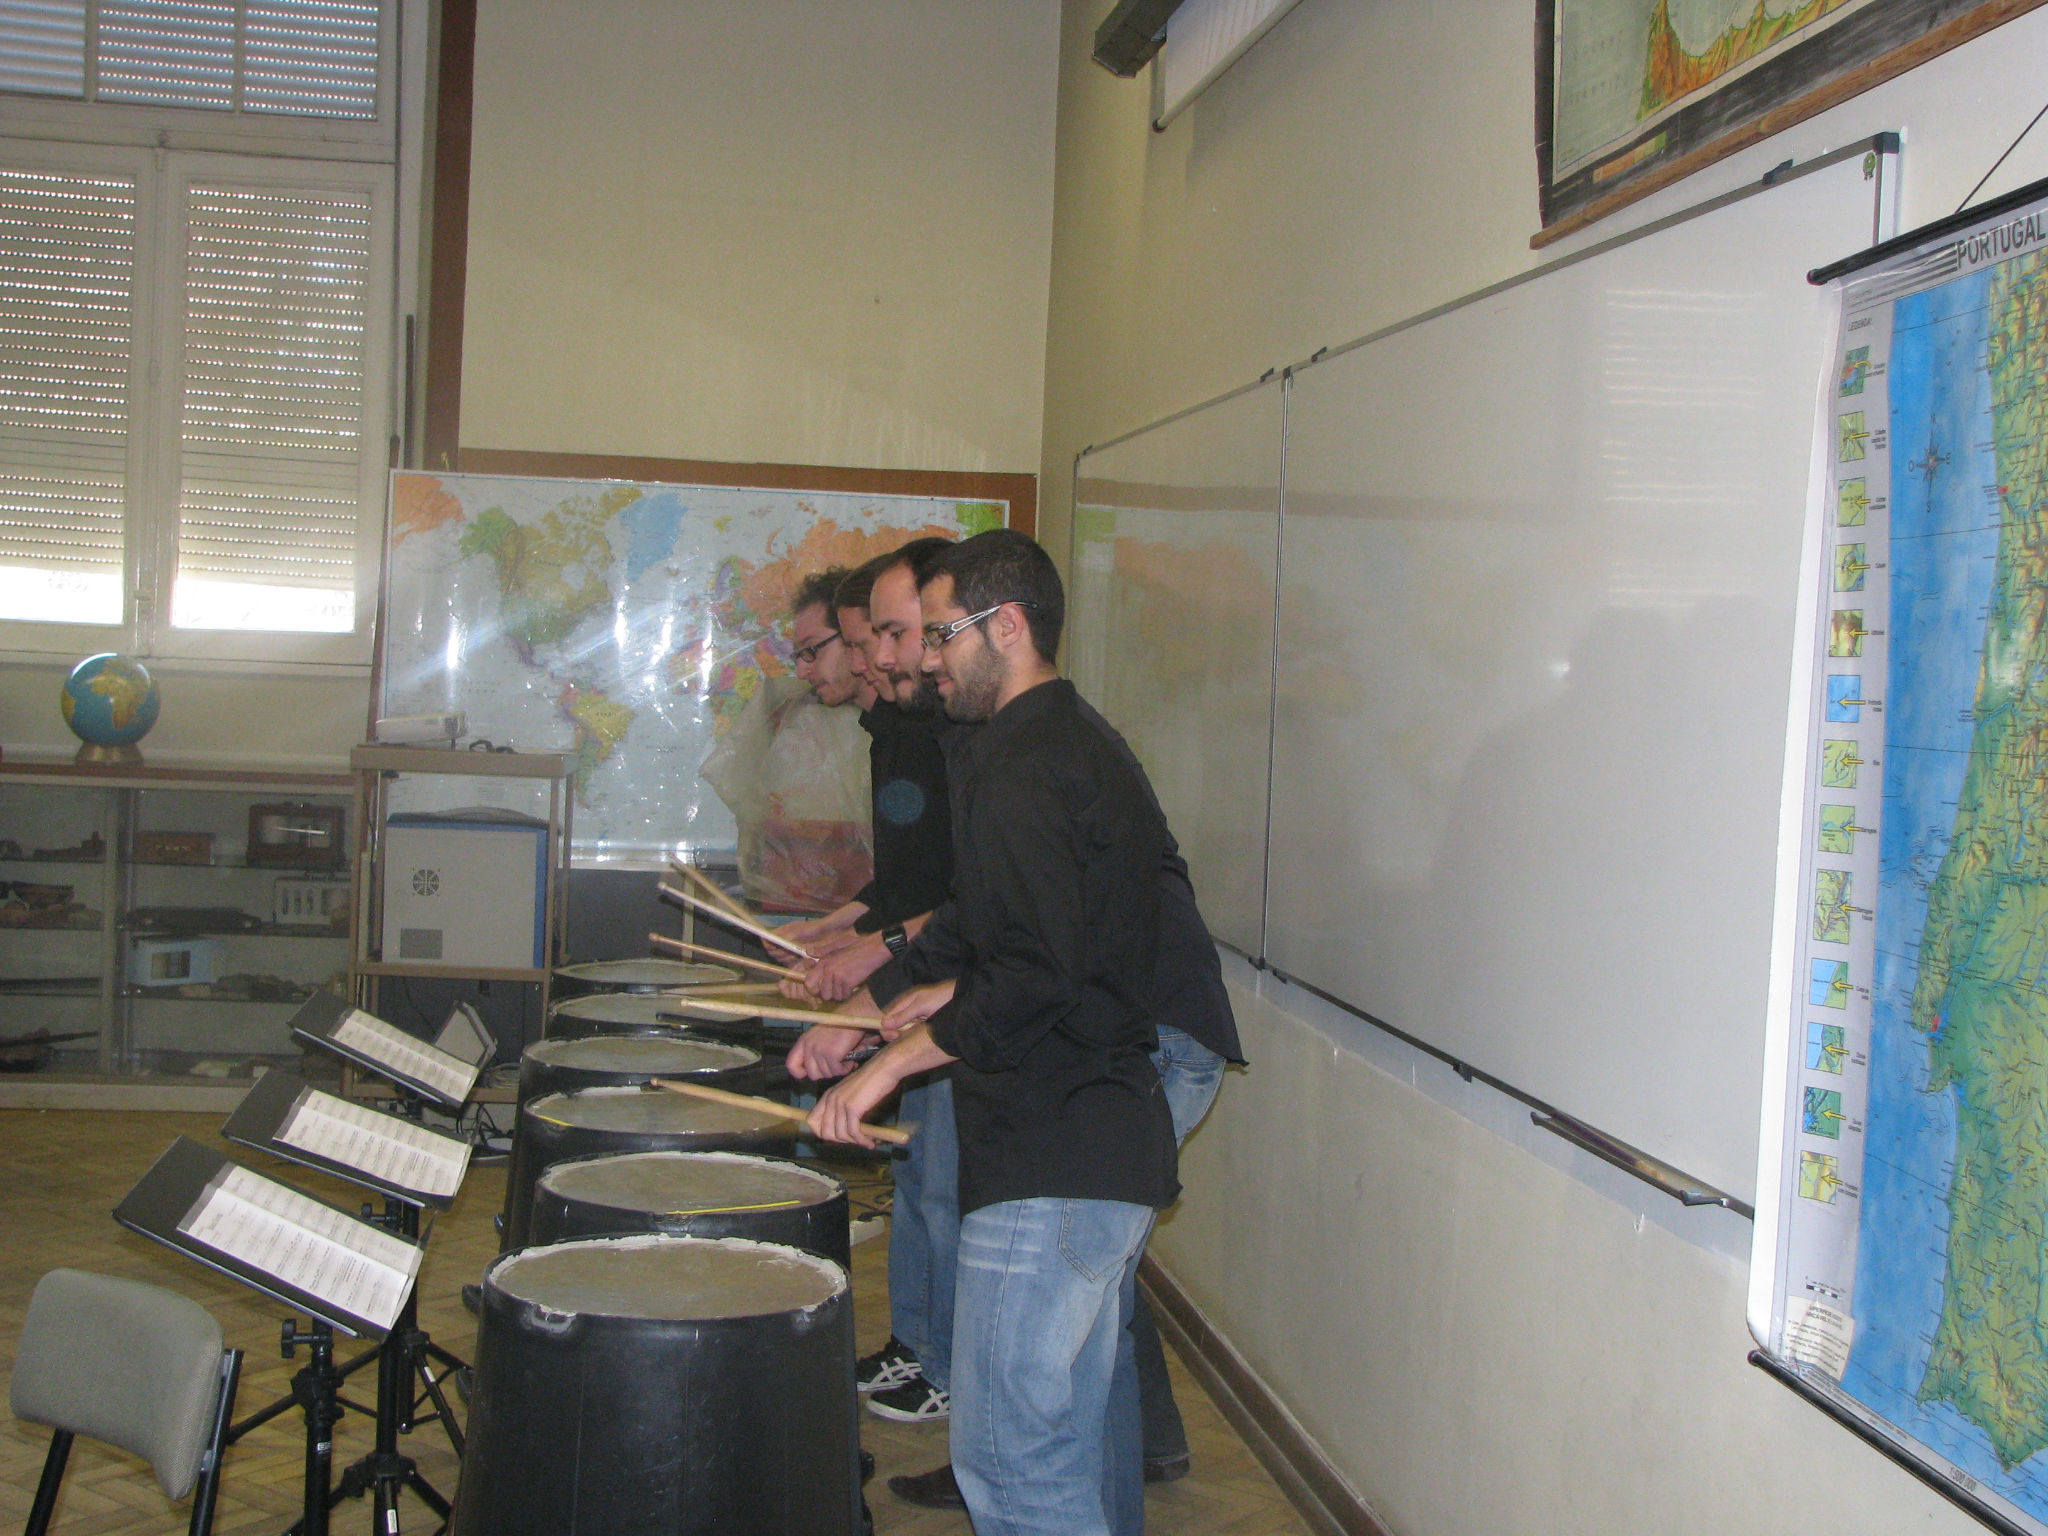 Concerto e Workshop no Liceu CamõesConcert and Workshop at Liceu Camões